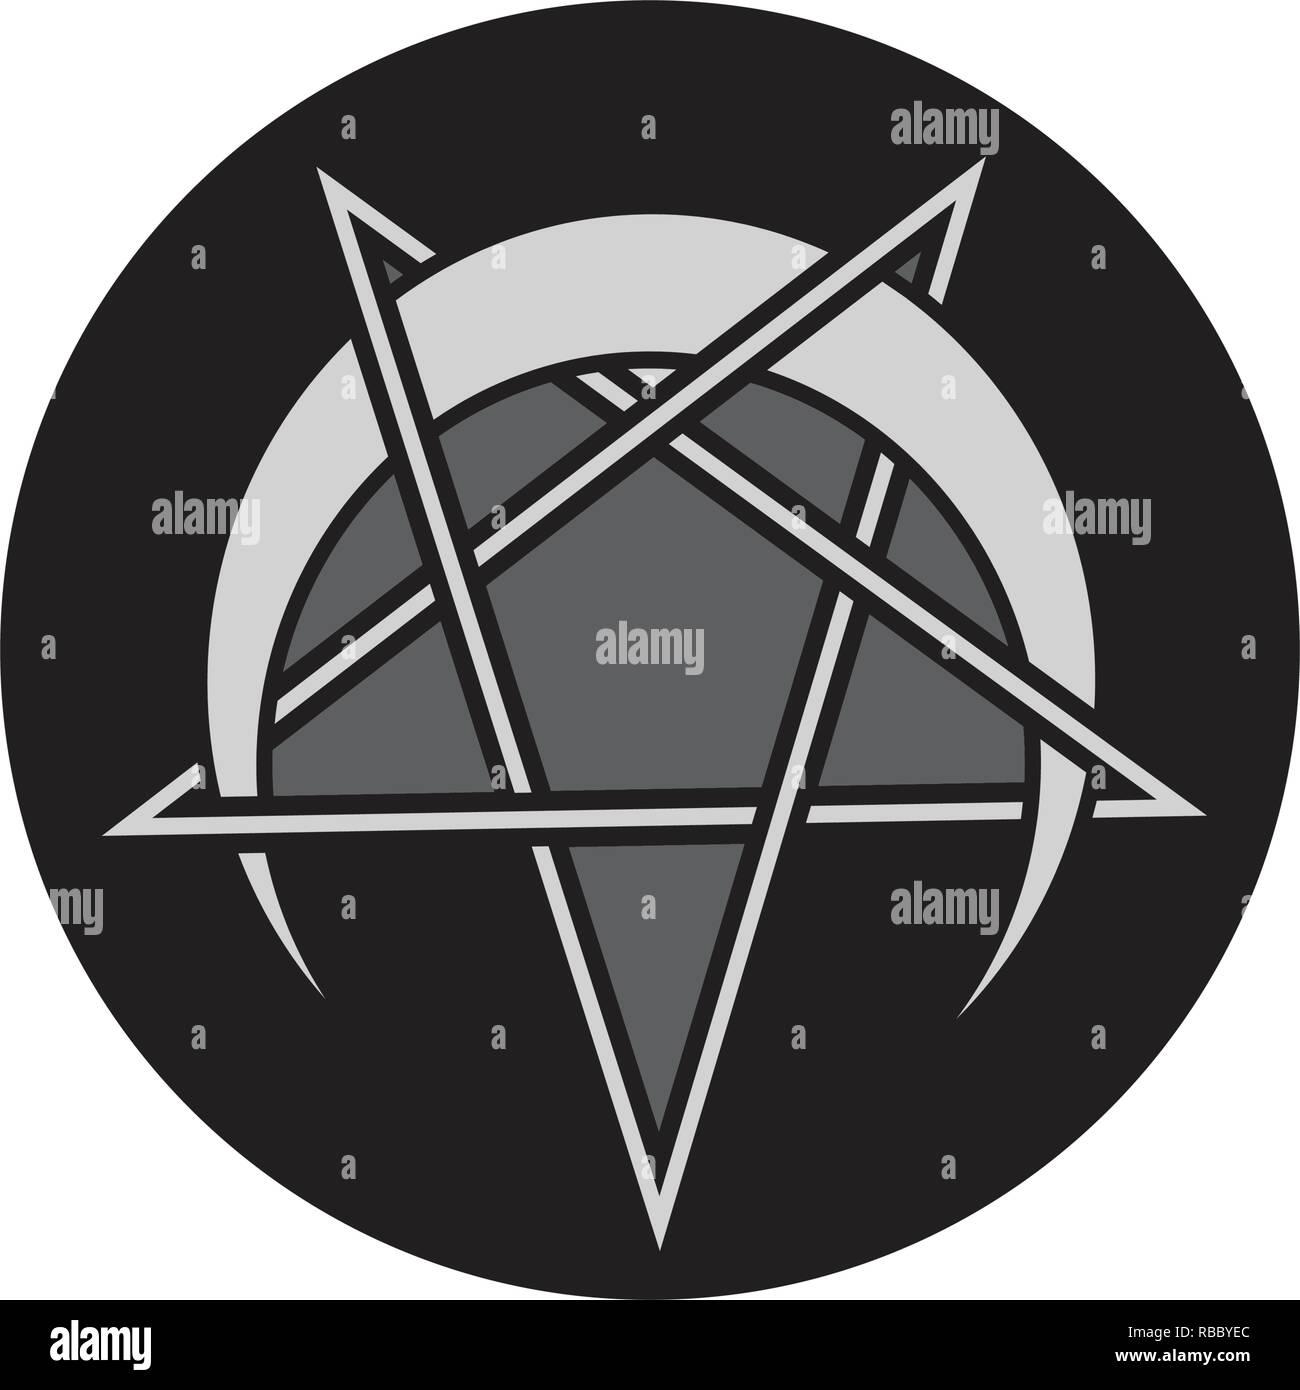 Reversed or Inverted Pentagram with upside down crescent